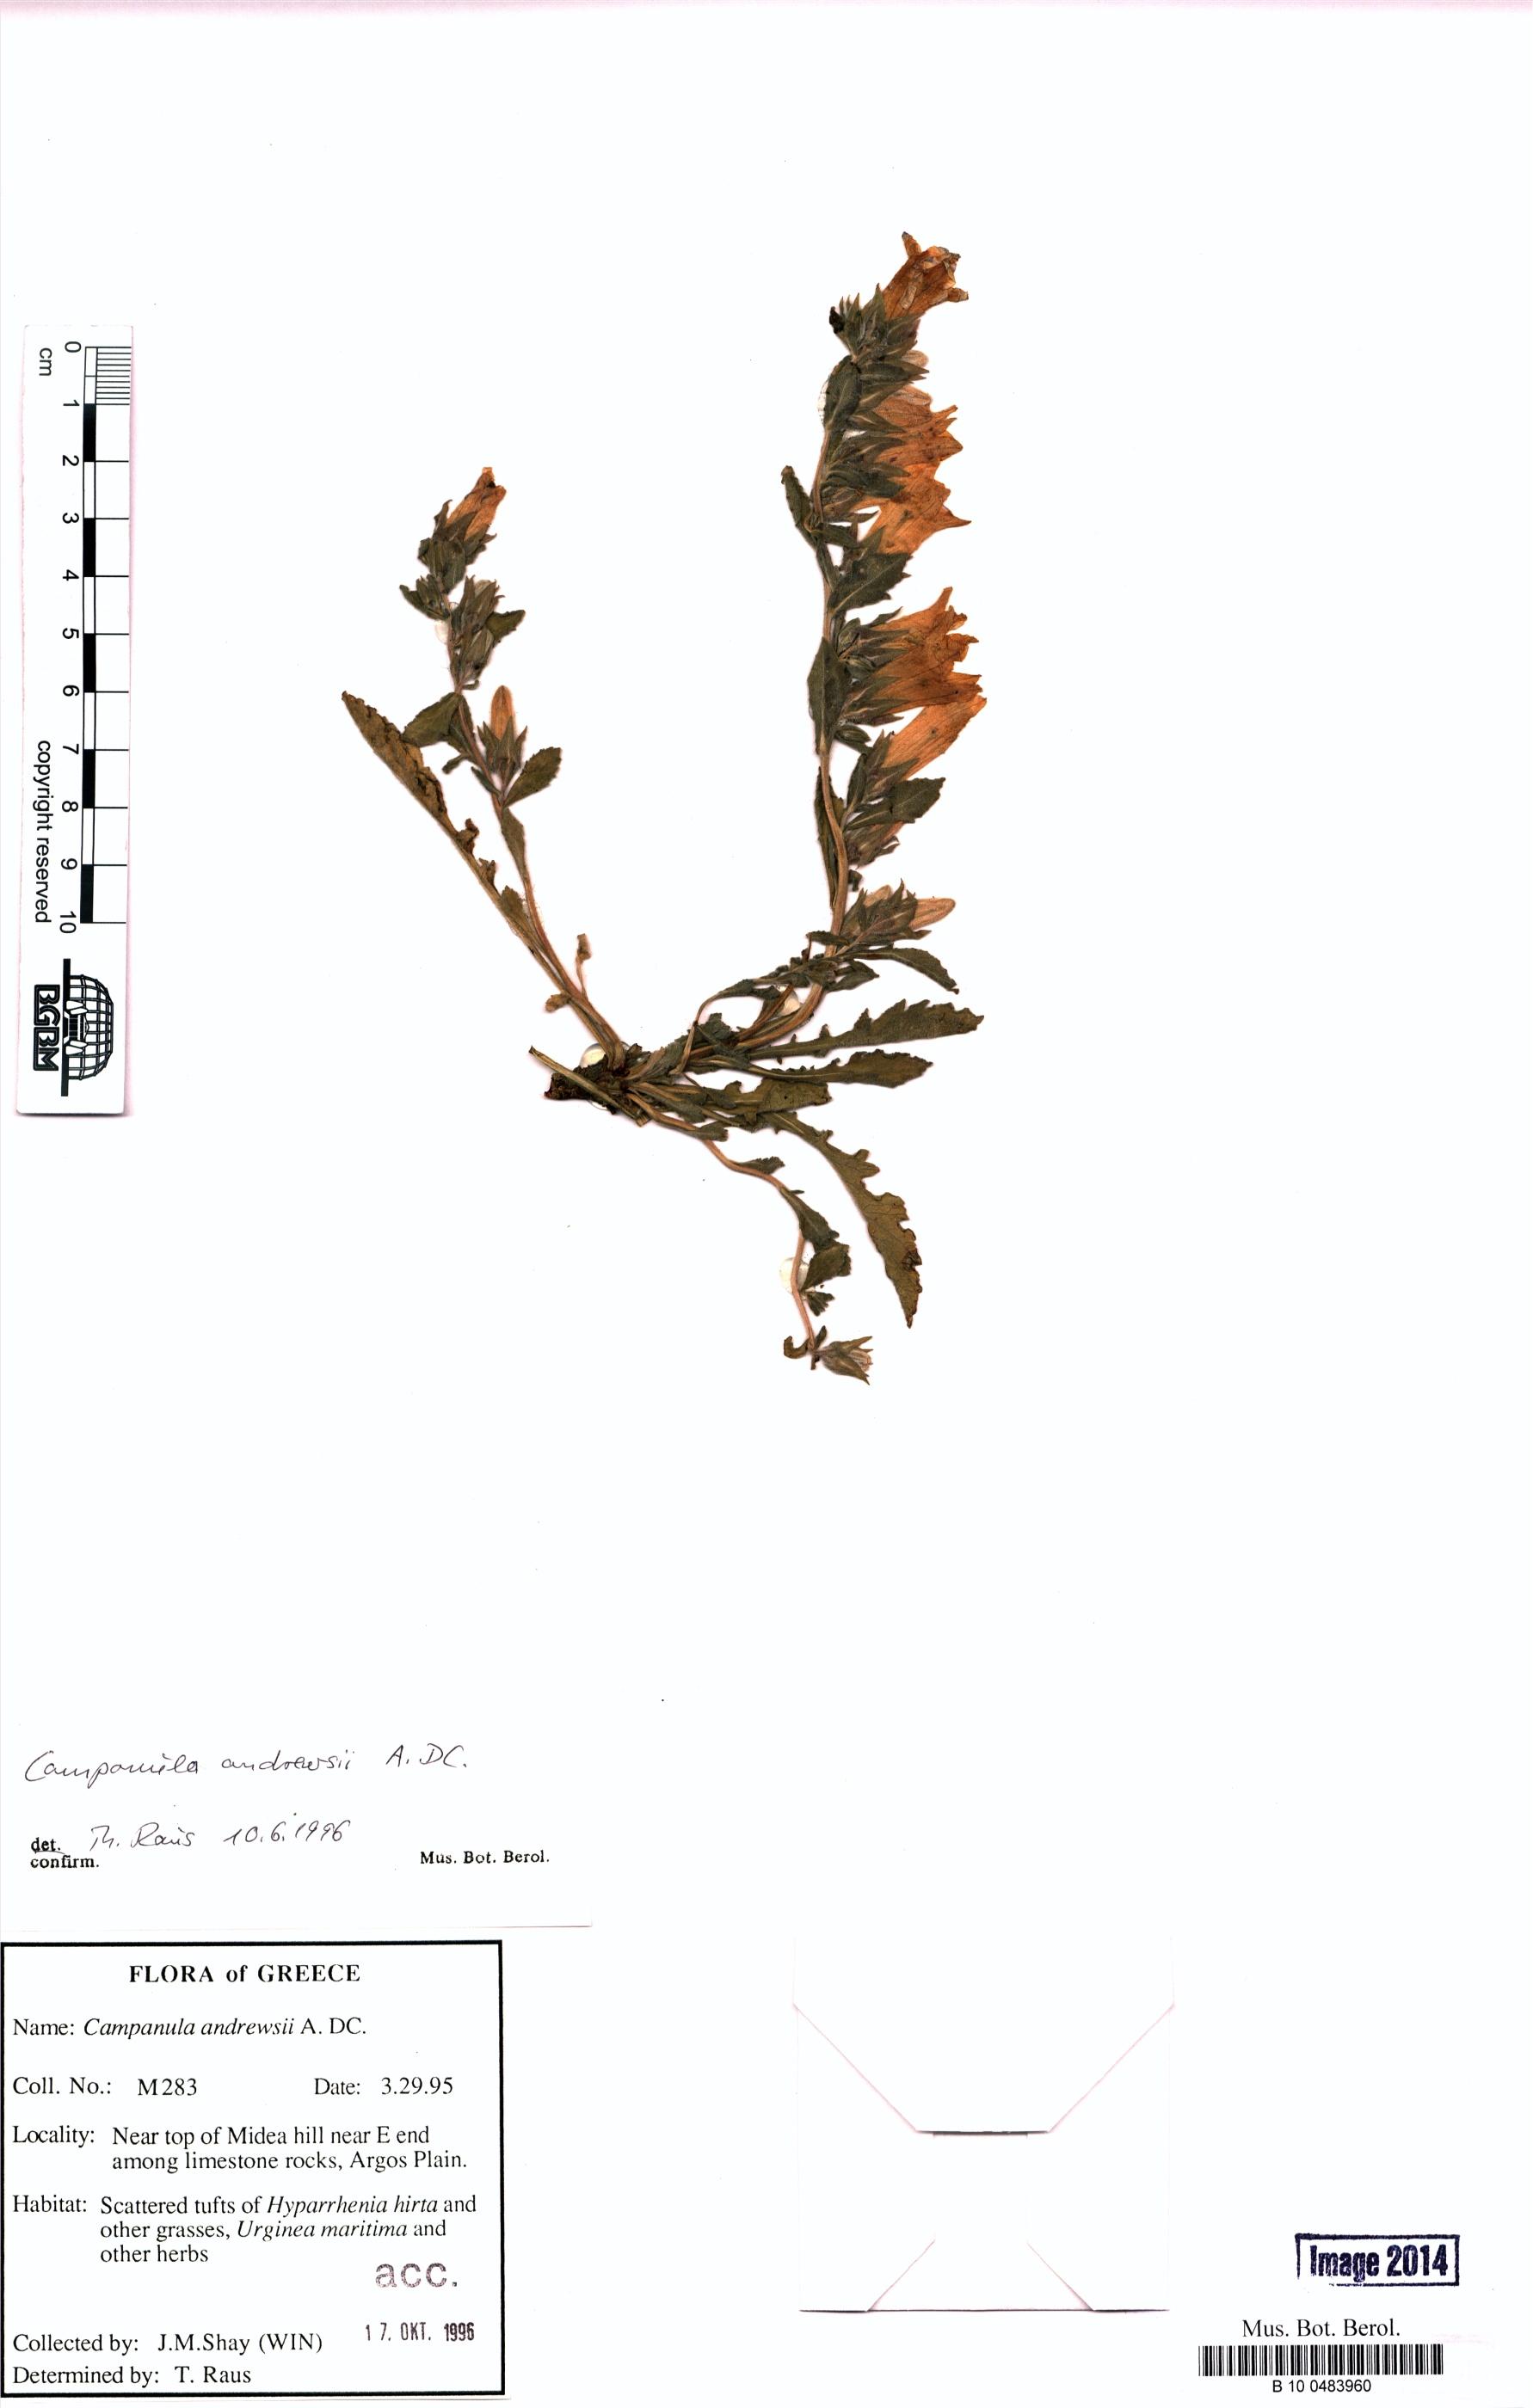 http://ww2.bgbm.org/herbarium/images/B/10/04/83/96/B_10_0483960.jpg